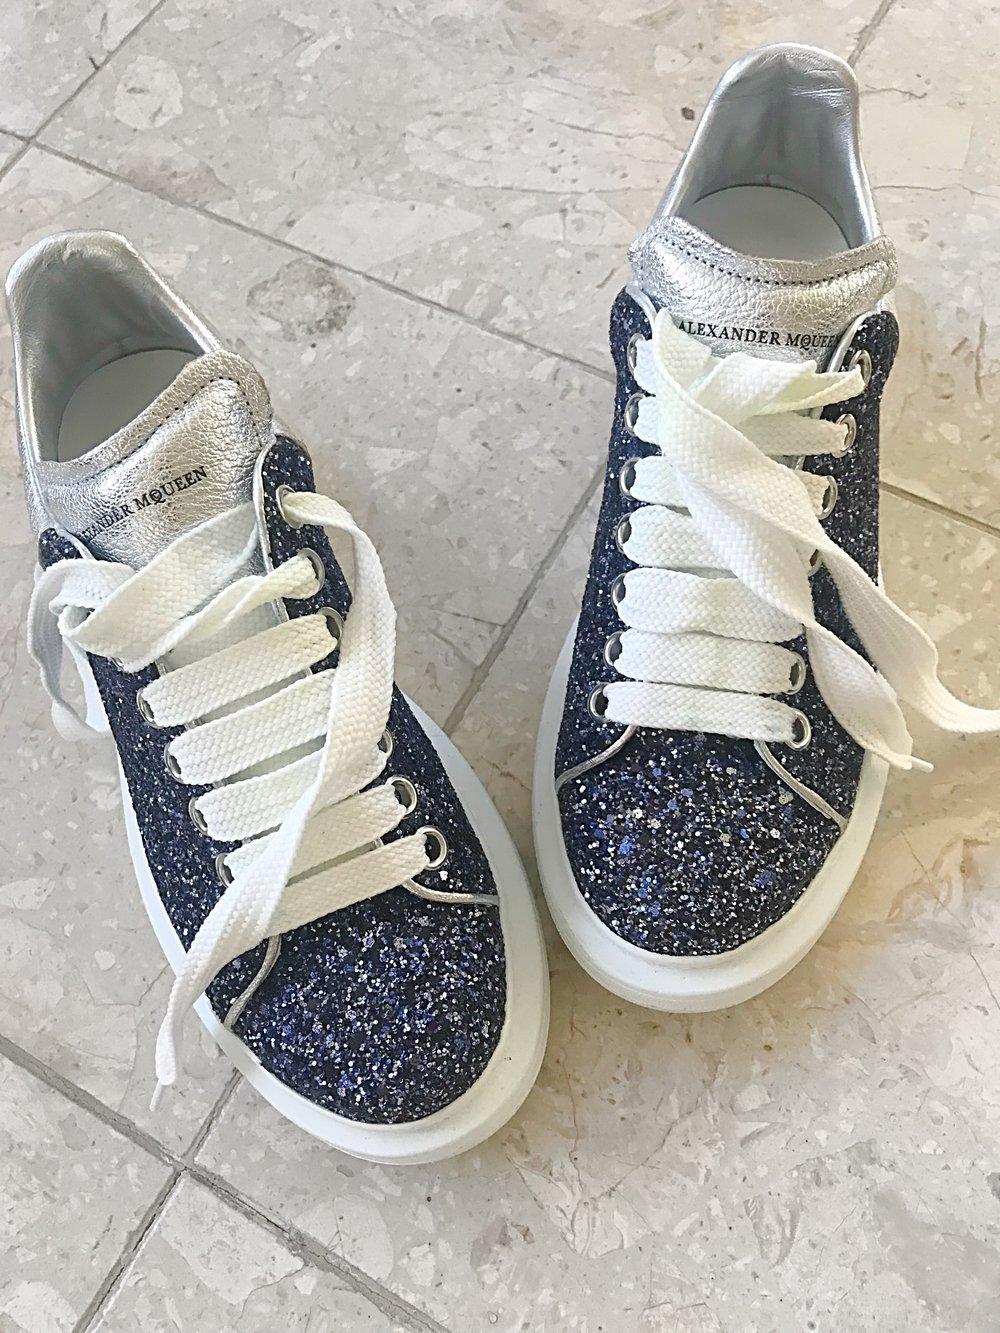 A shoes.jpg